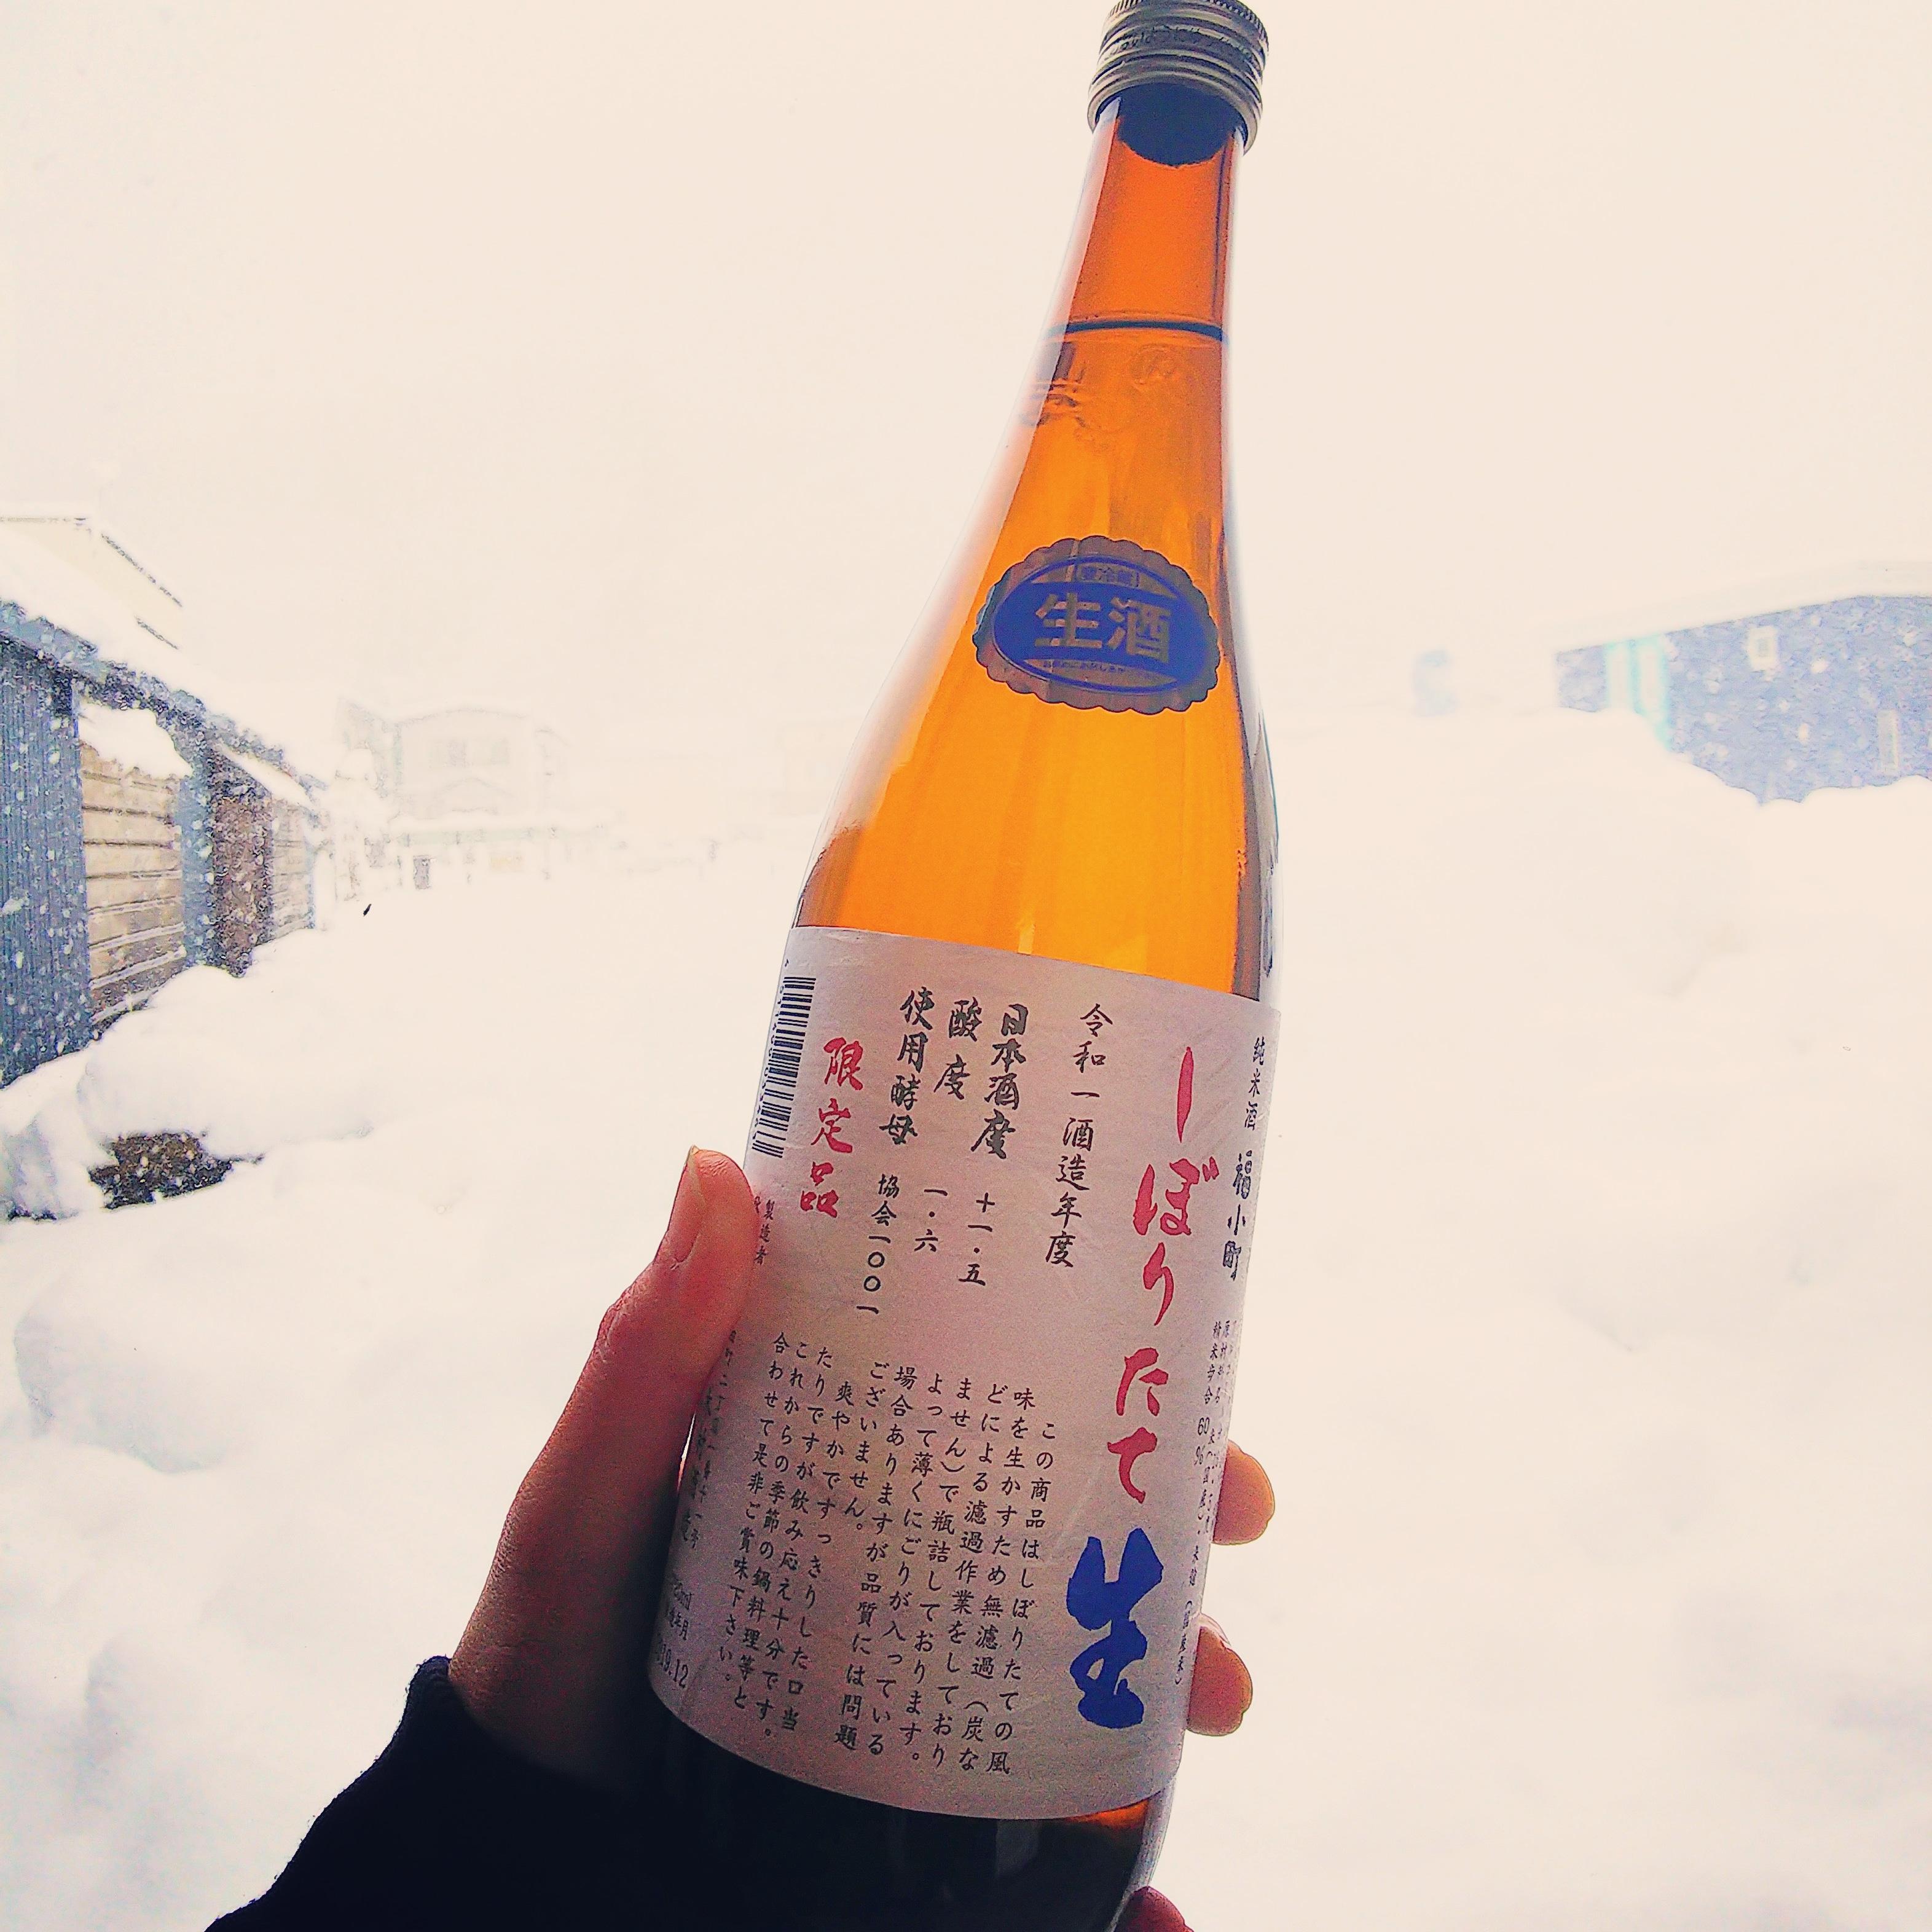 http://www.fukukomachi.com/blog/photo/IMG_20191204_110147_148.jpg